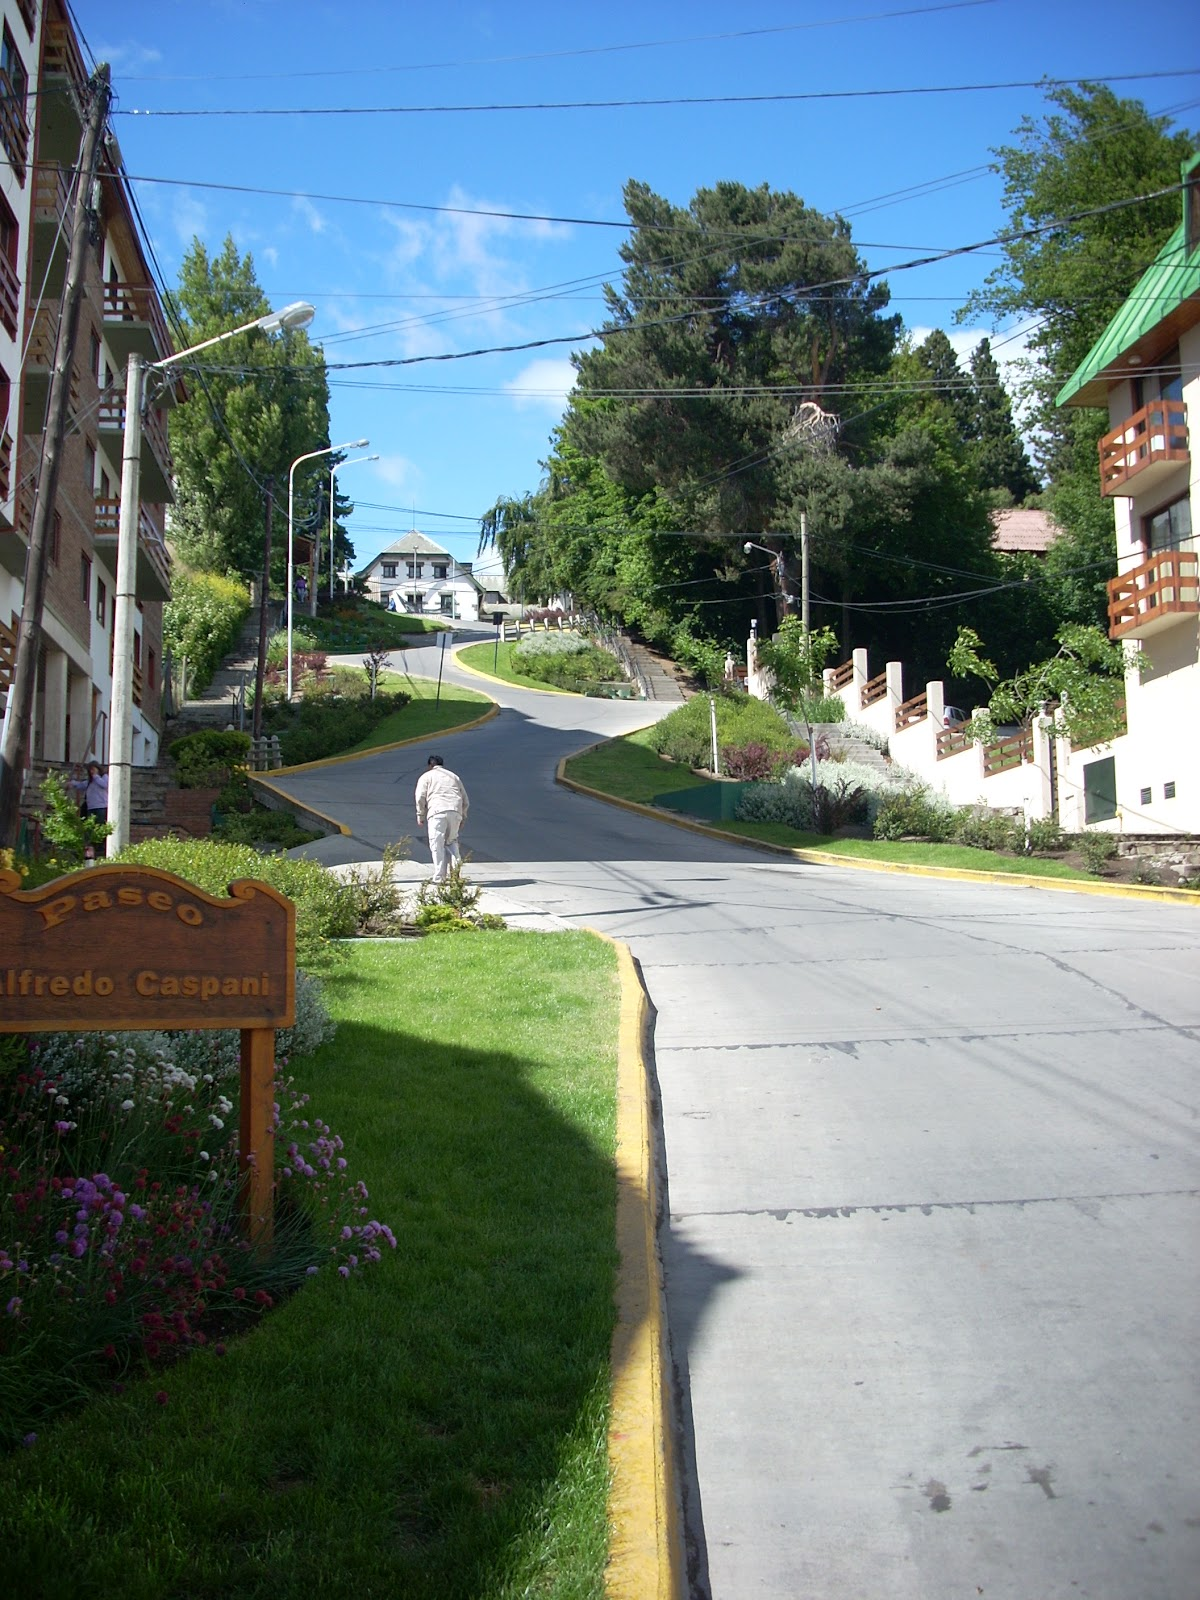 Steep streets in Bariloche